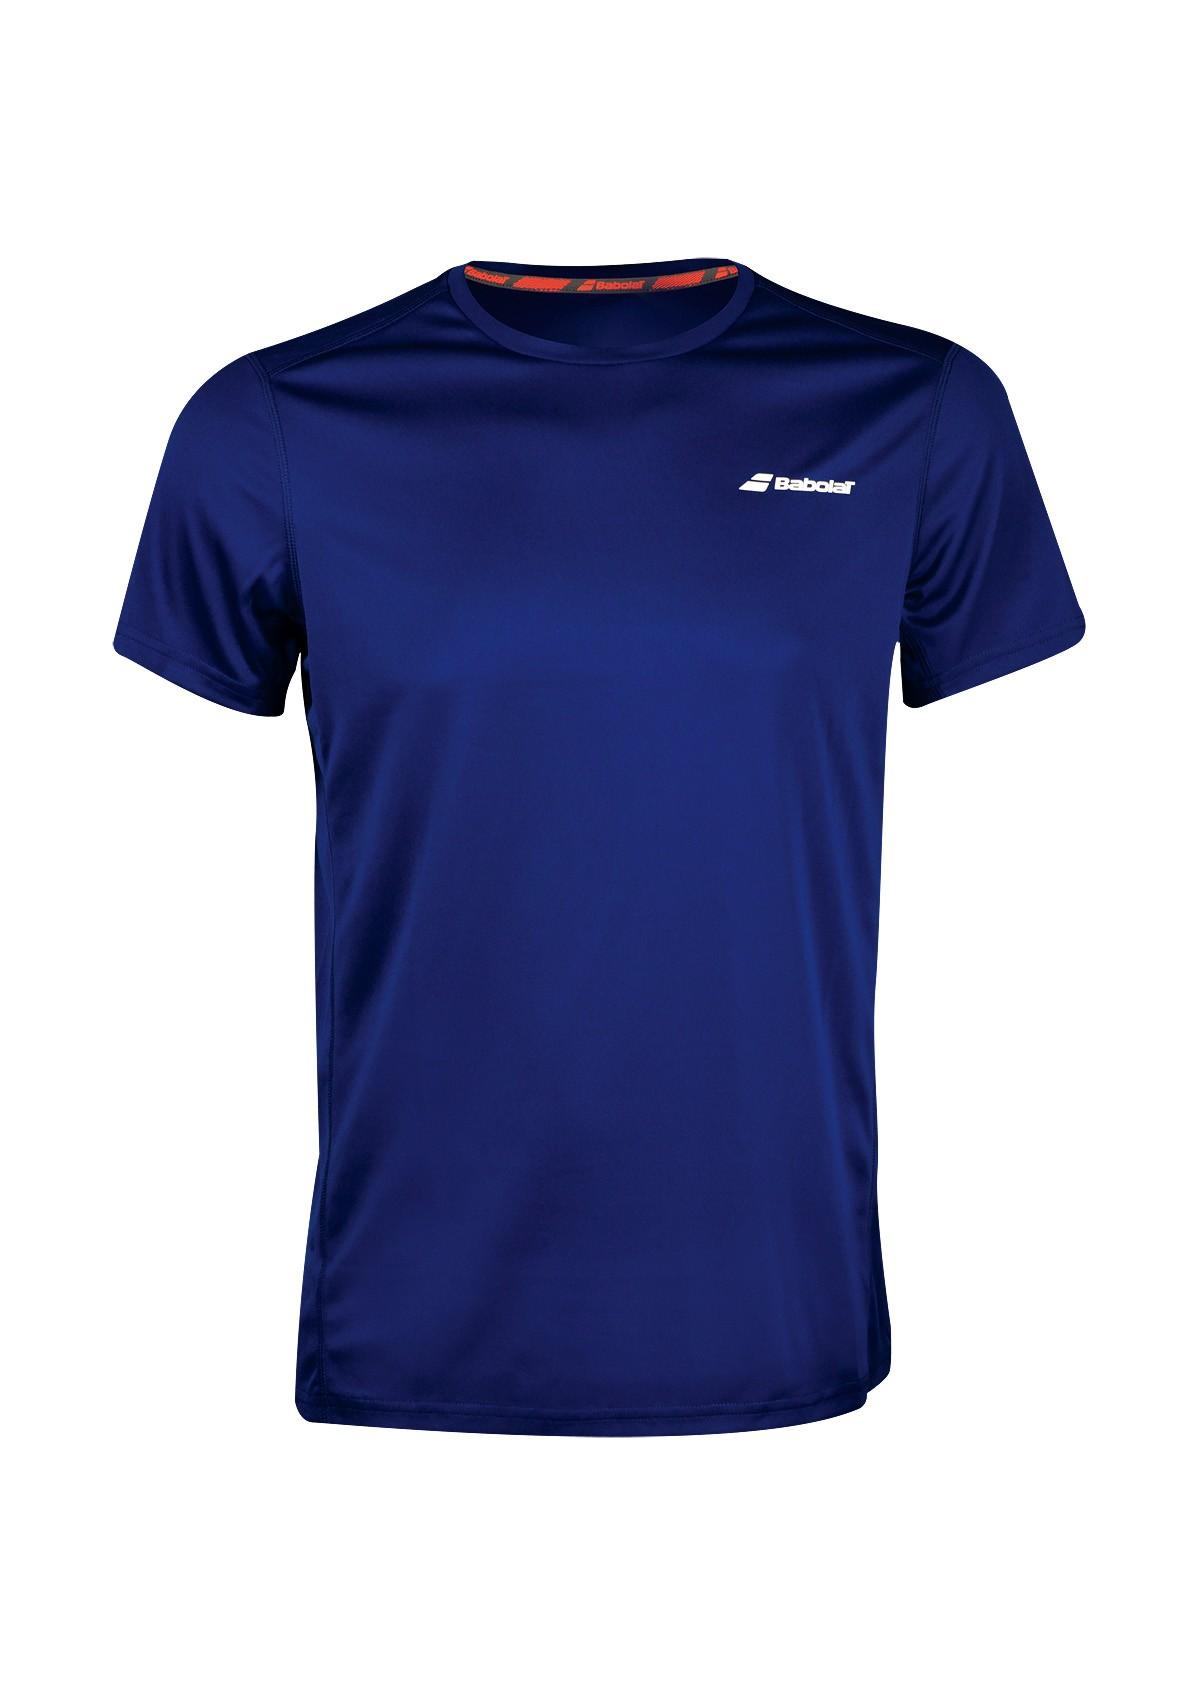 Koszulka tenisowa chłopięca Babolat CORE T-shirt Navy -45%